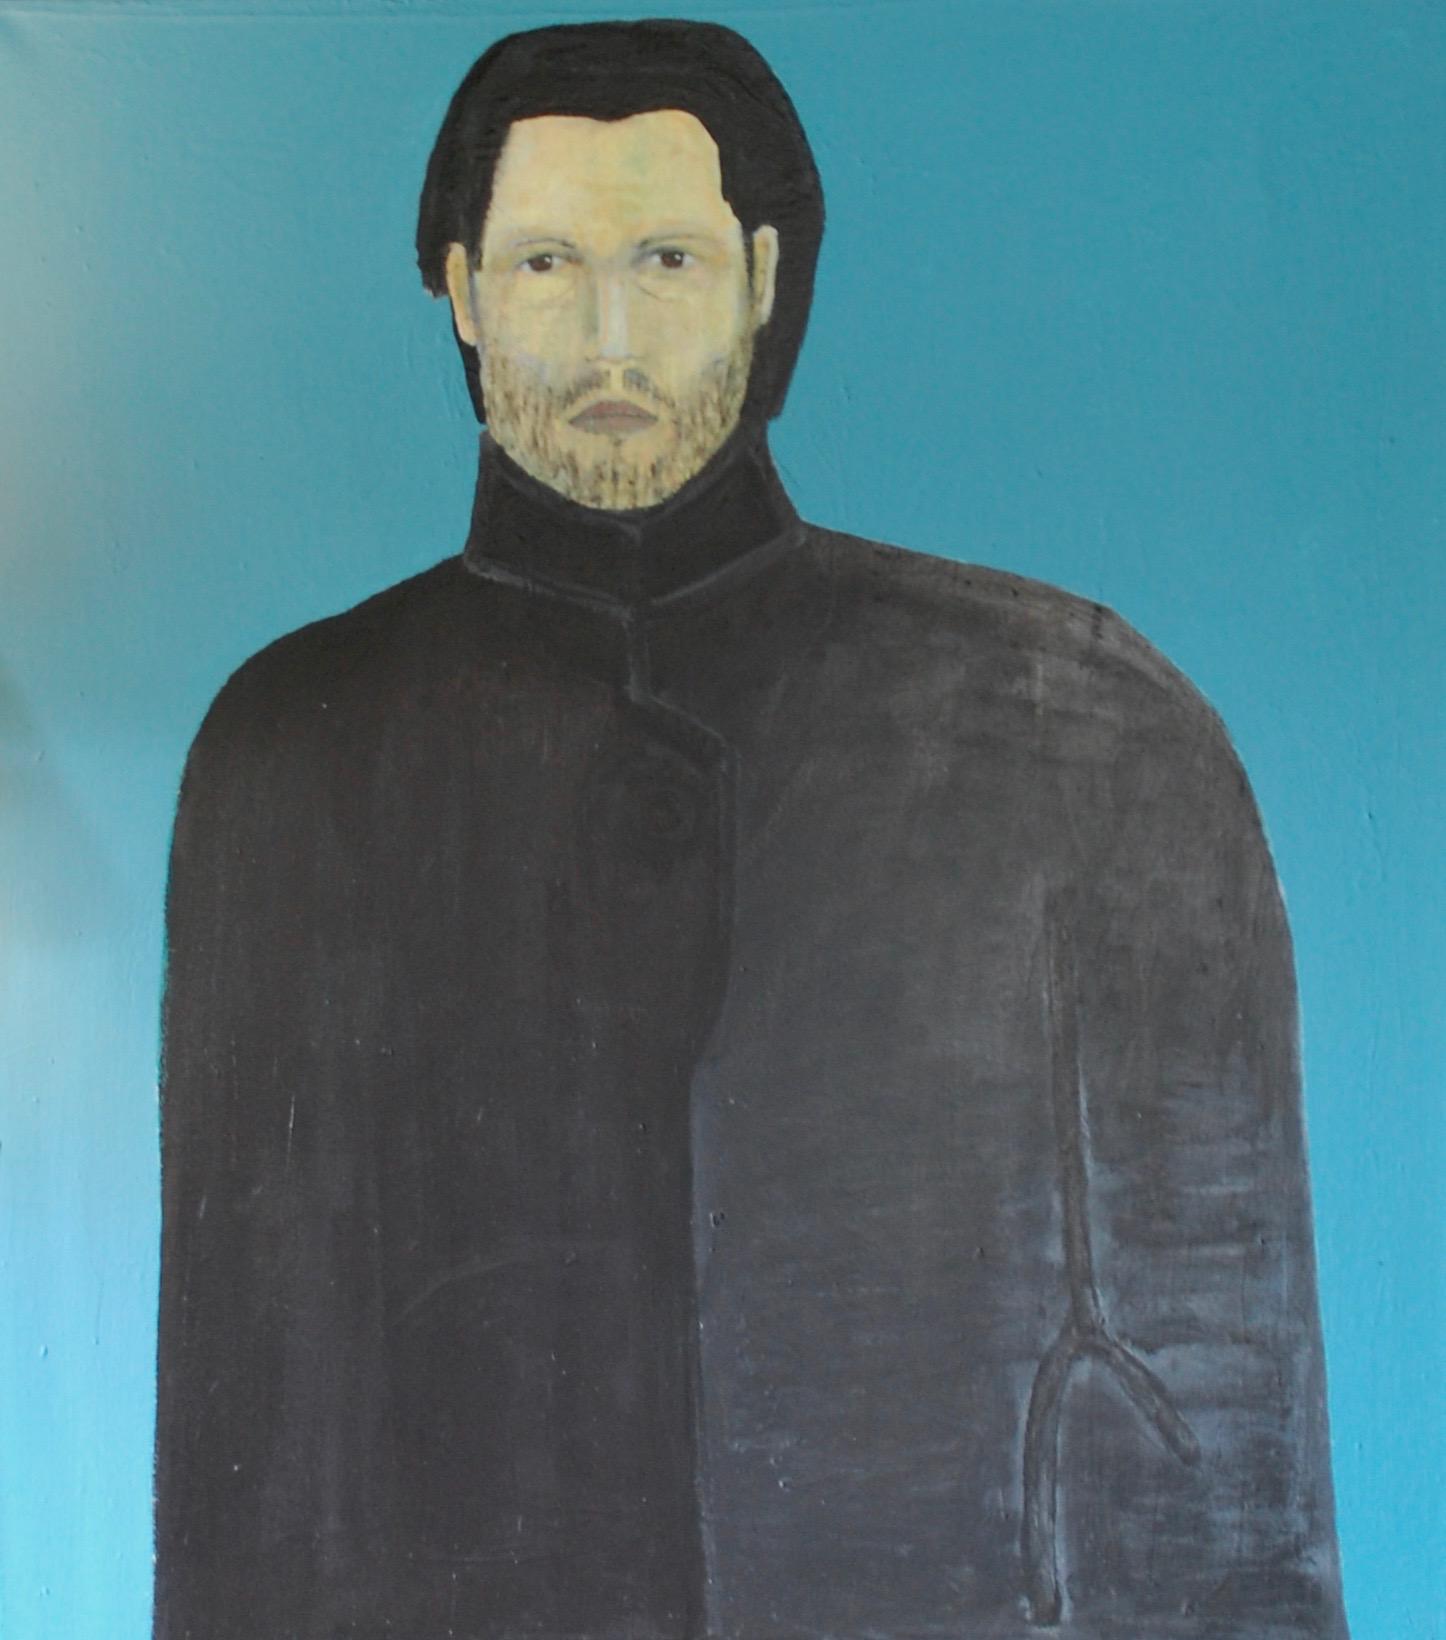 Self portrait, 2001-2017